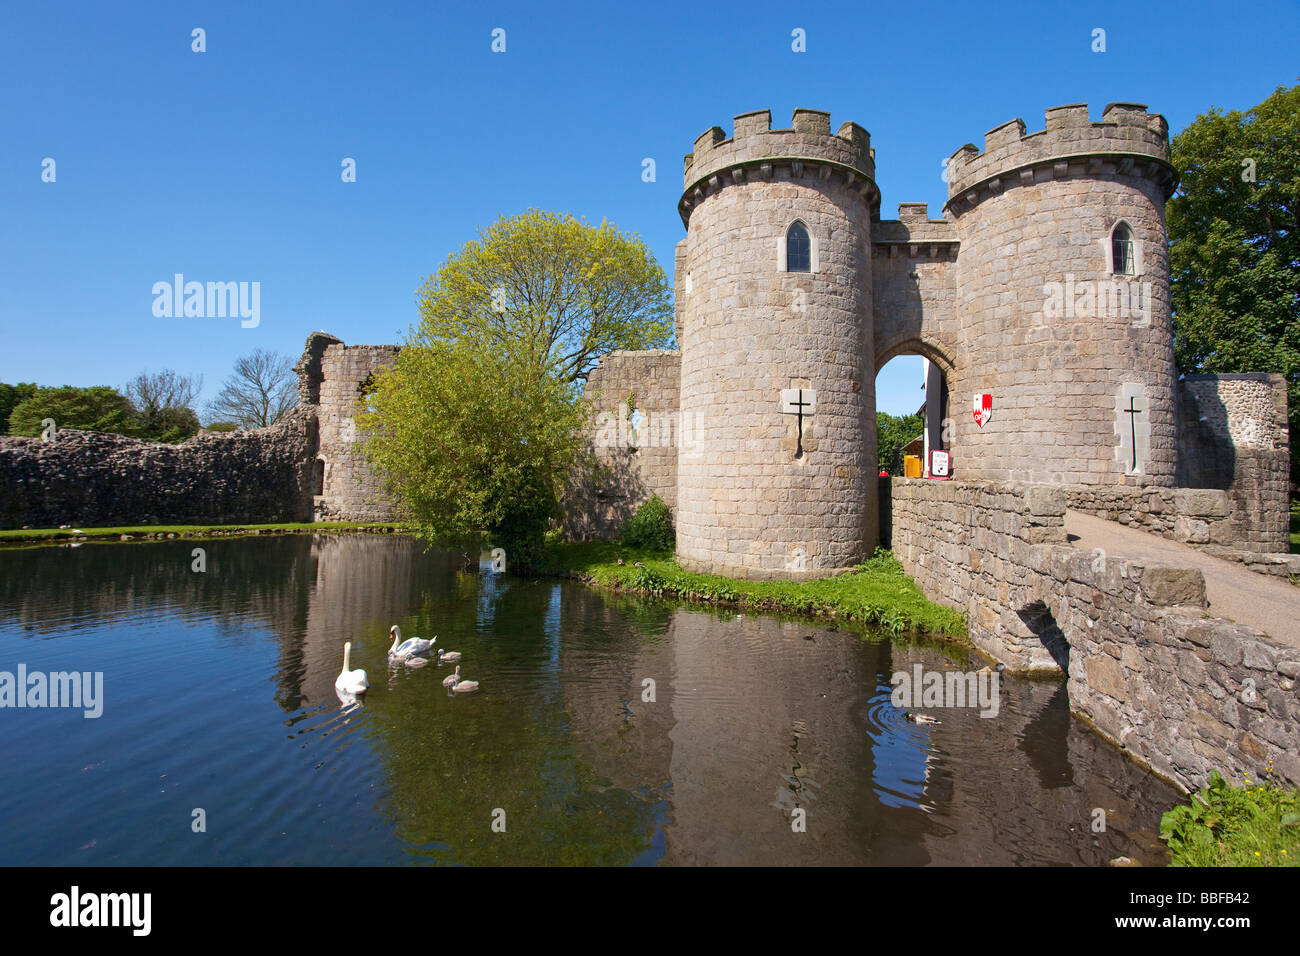 Mute Swan Family Cygnus Olor In Moat At Whittington Castle